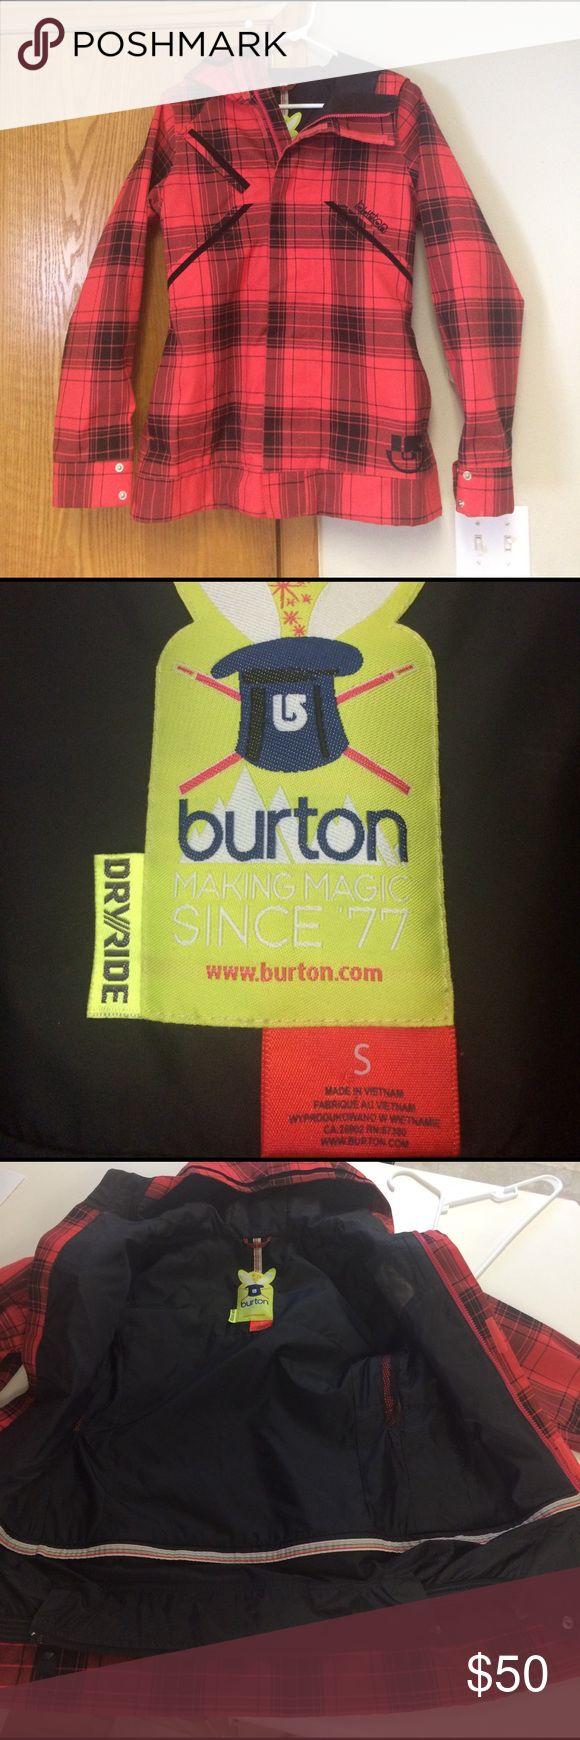 SALE!! Burton dryride snowboard jacket Black and red plaid Burton jacket. SALE TODAY ONLY 2/16/2017 Burton Jackets & Coats